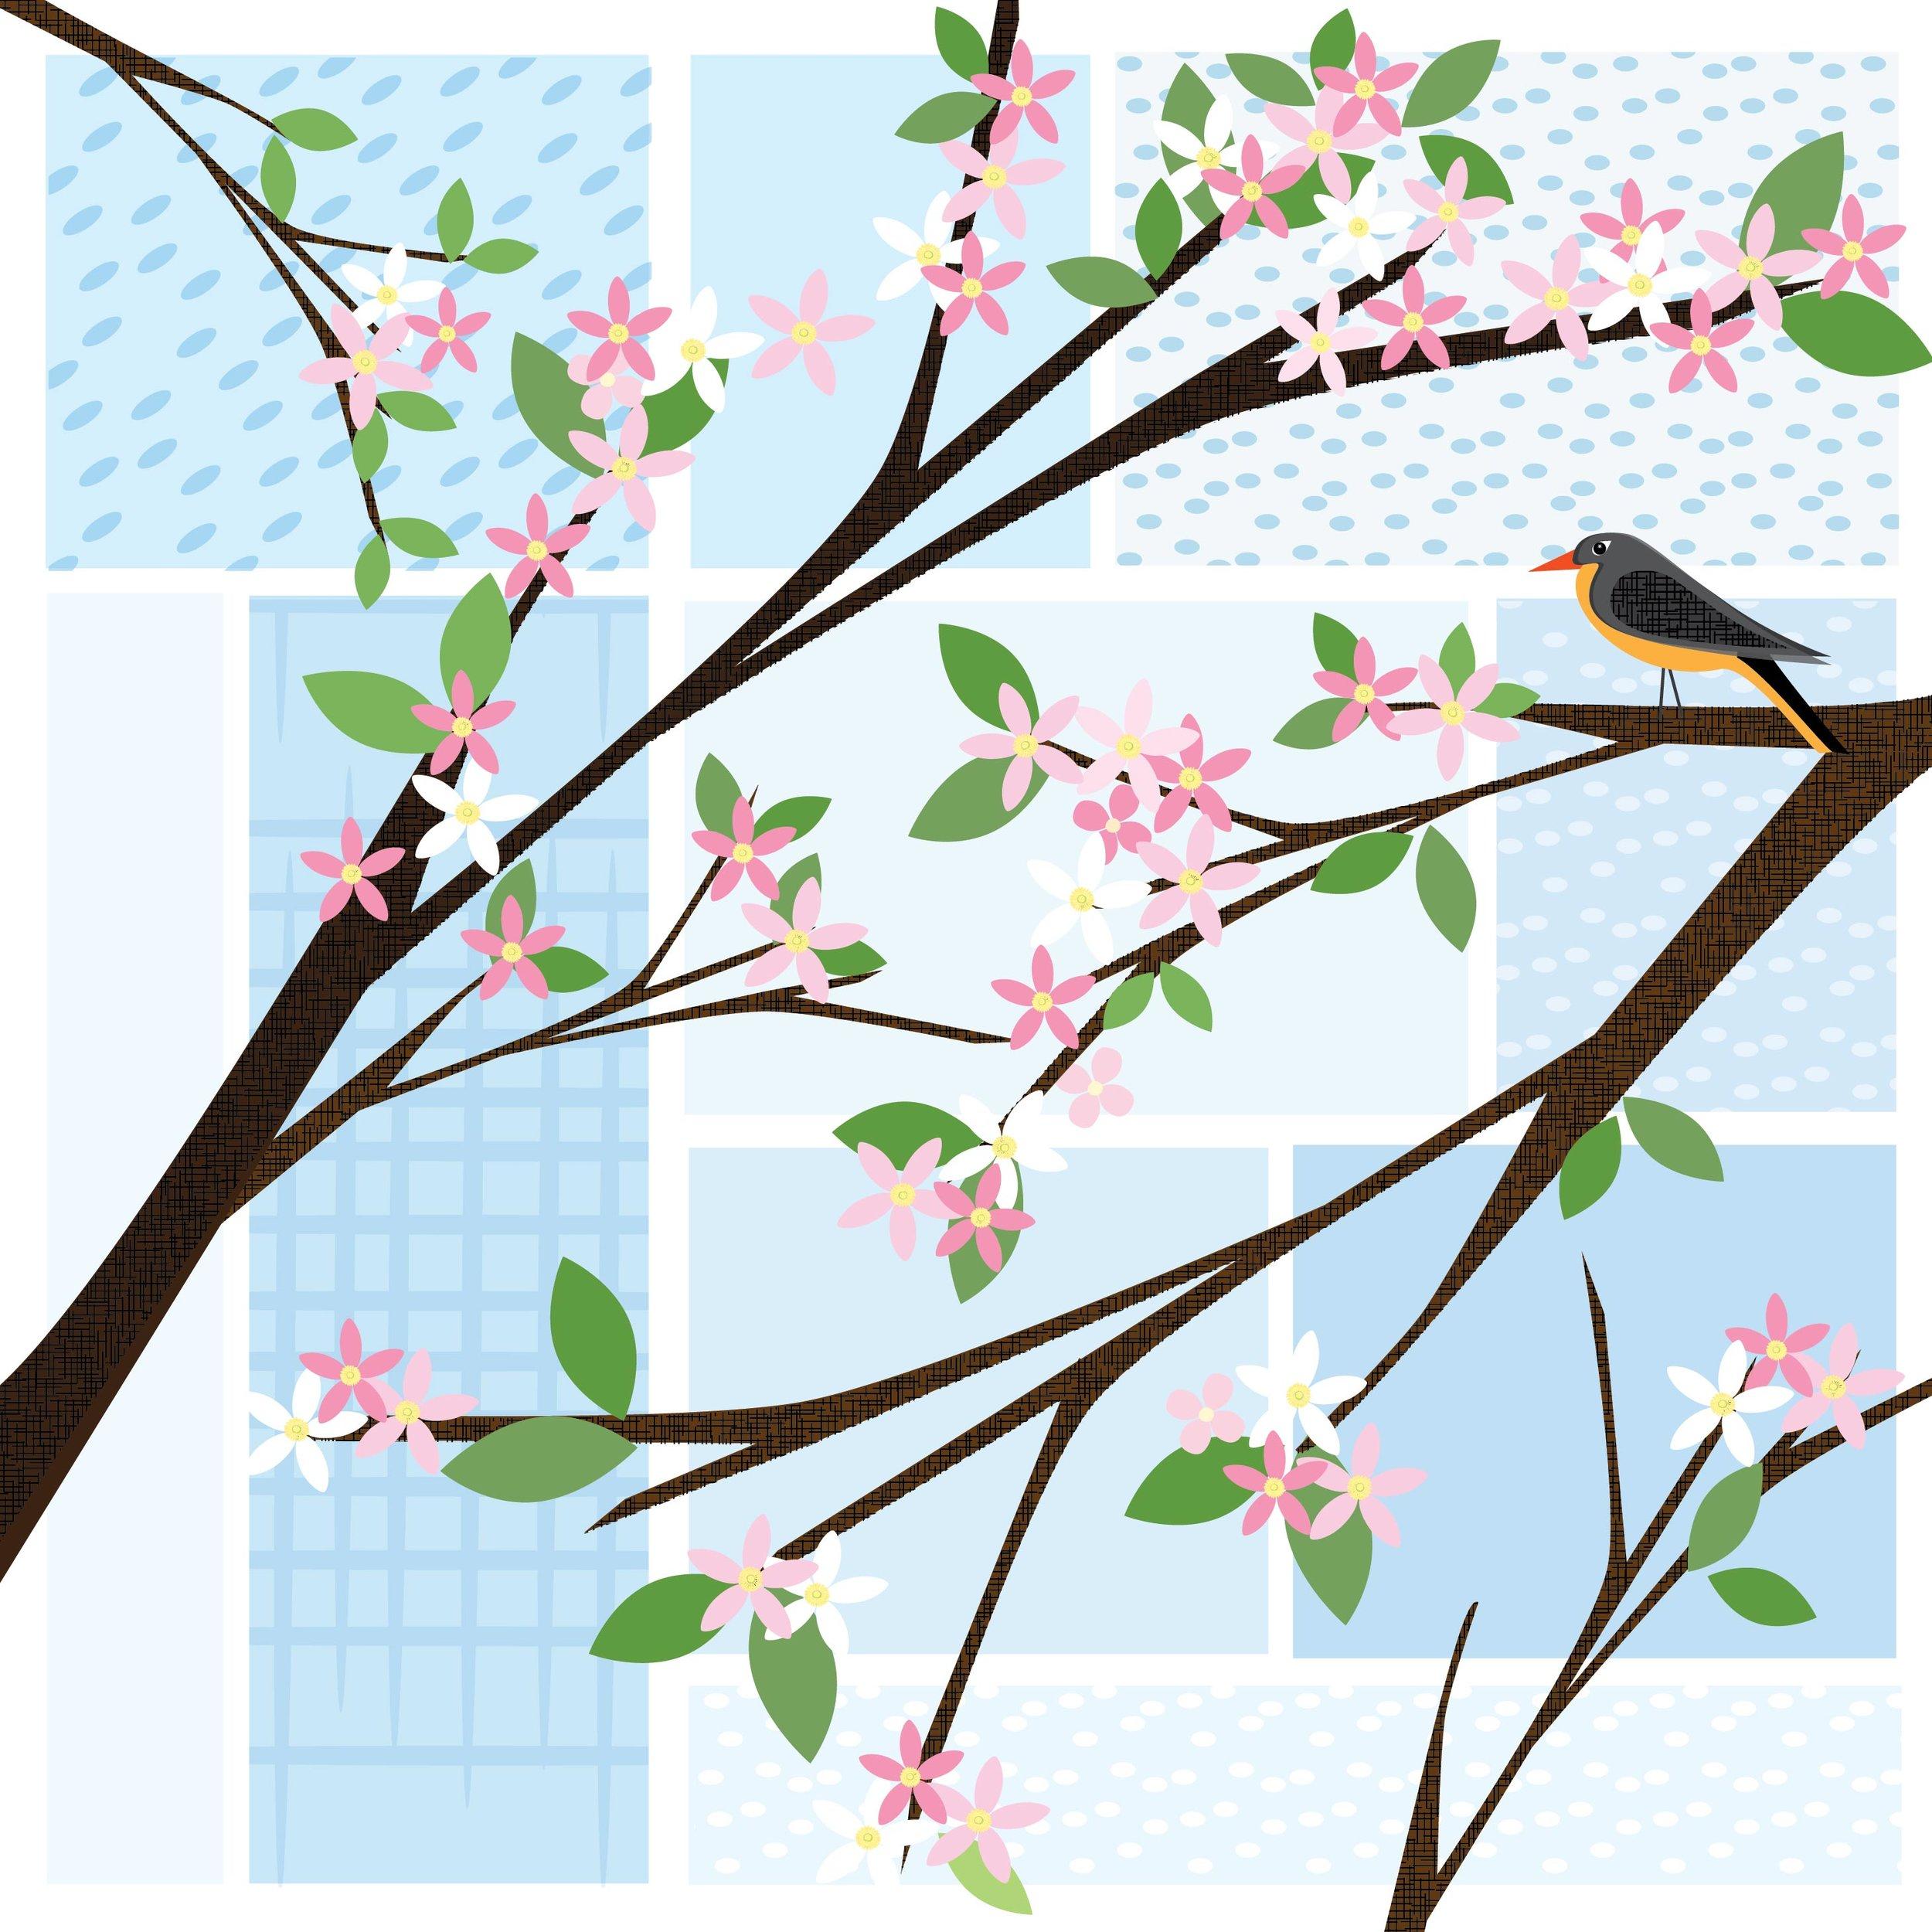 springtime2-03.jpg